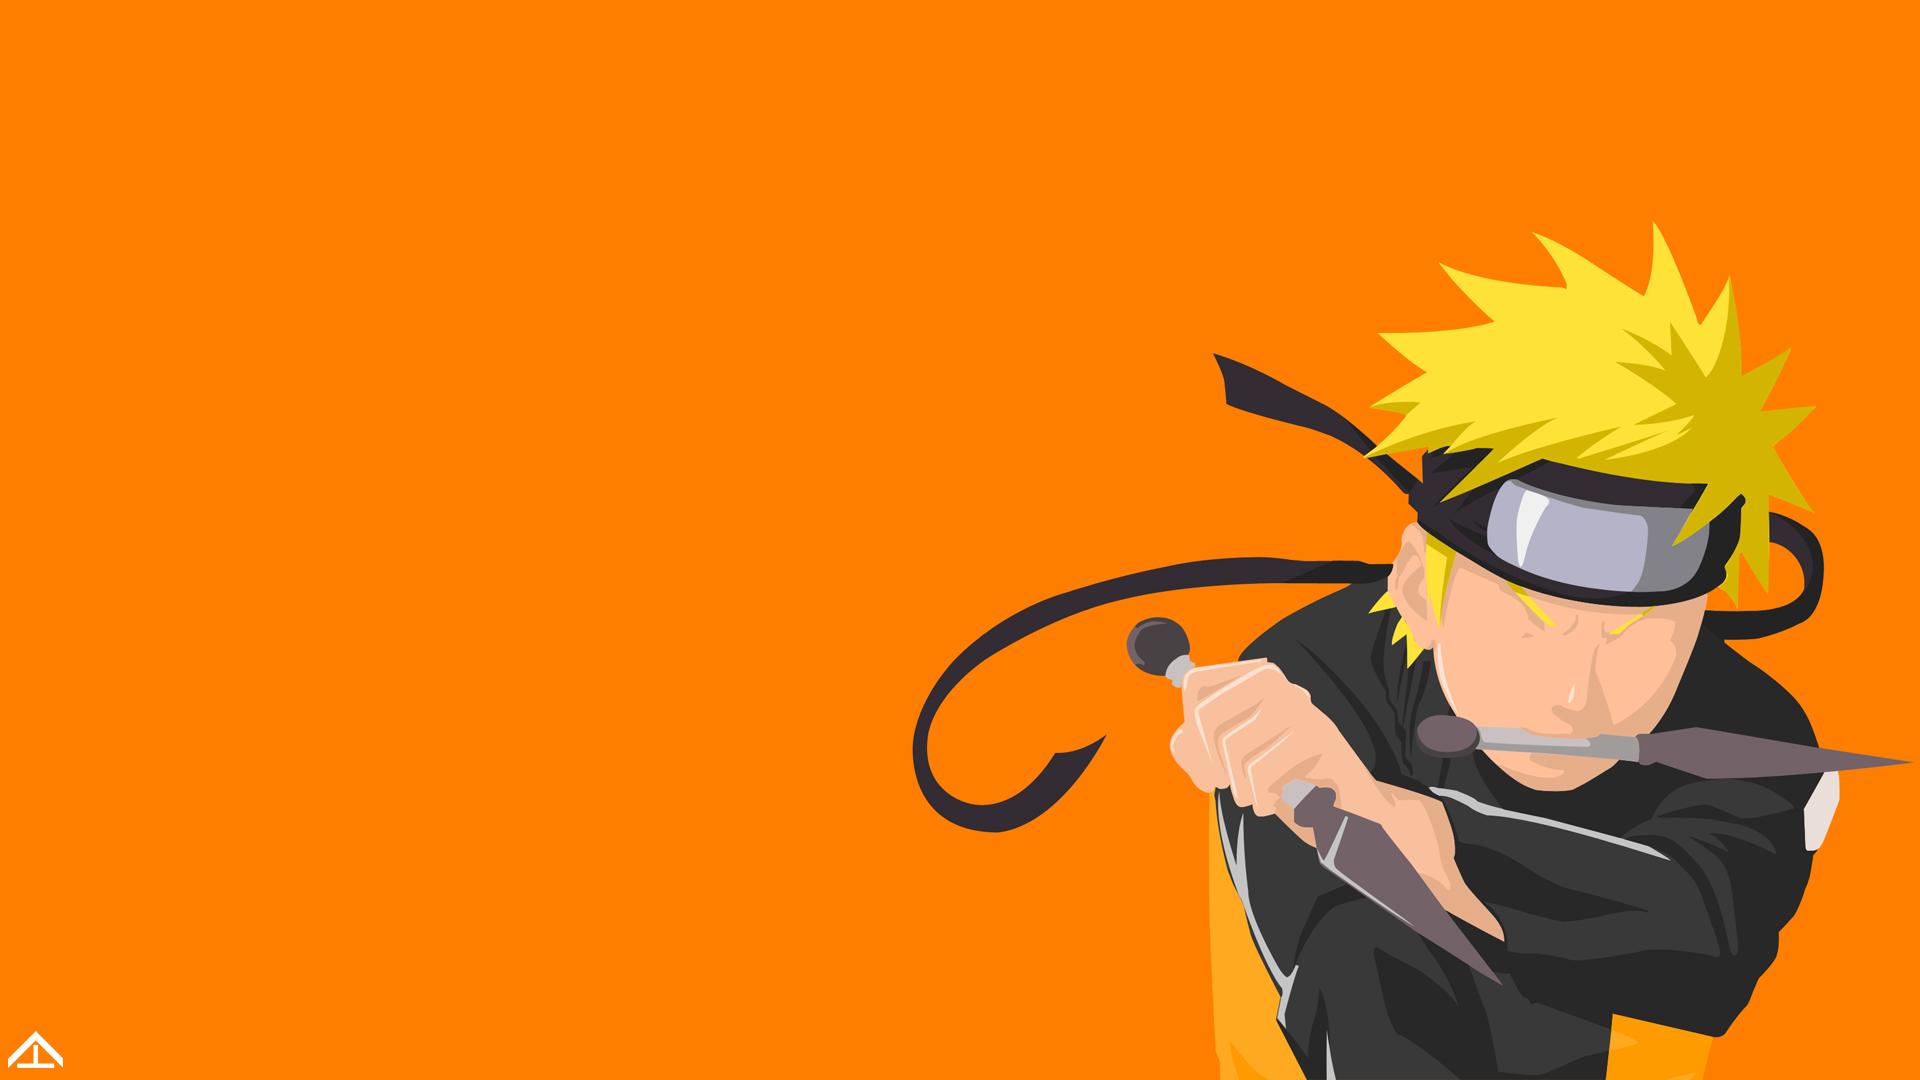 Amazing Wallpaper Naruto Minimalistic - naruto_minimalist_by_hailstone294-dbbvu3m  Collection_264991.jpg